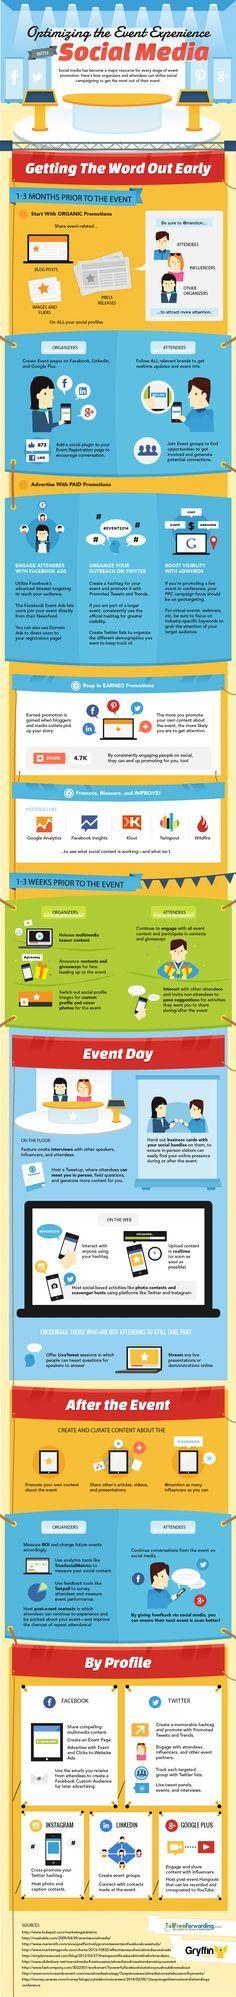 "SOCIAL MEDIA -         ""How To Use Social Media To Promote Events - #Infographic #SocialMedia #Marketing""."